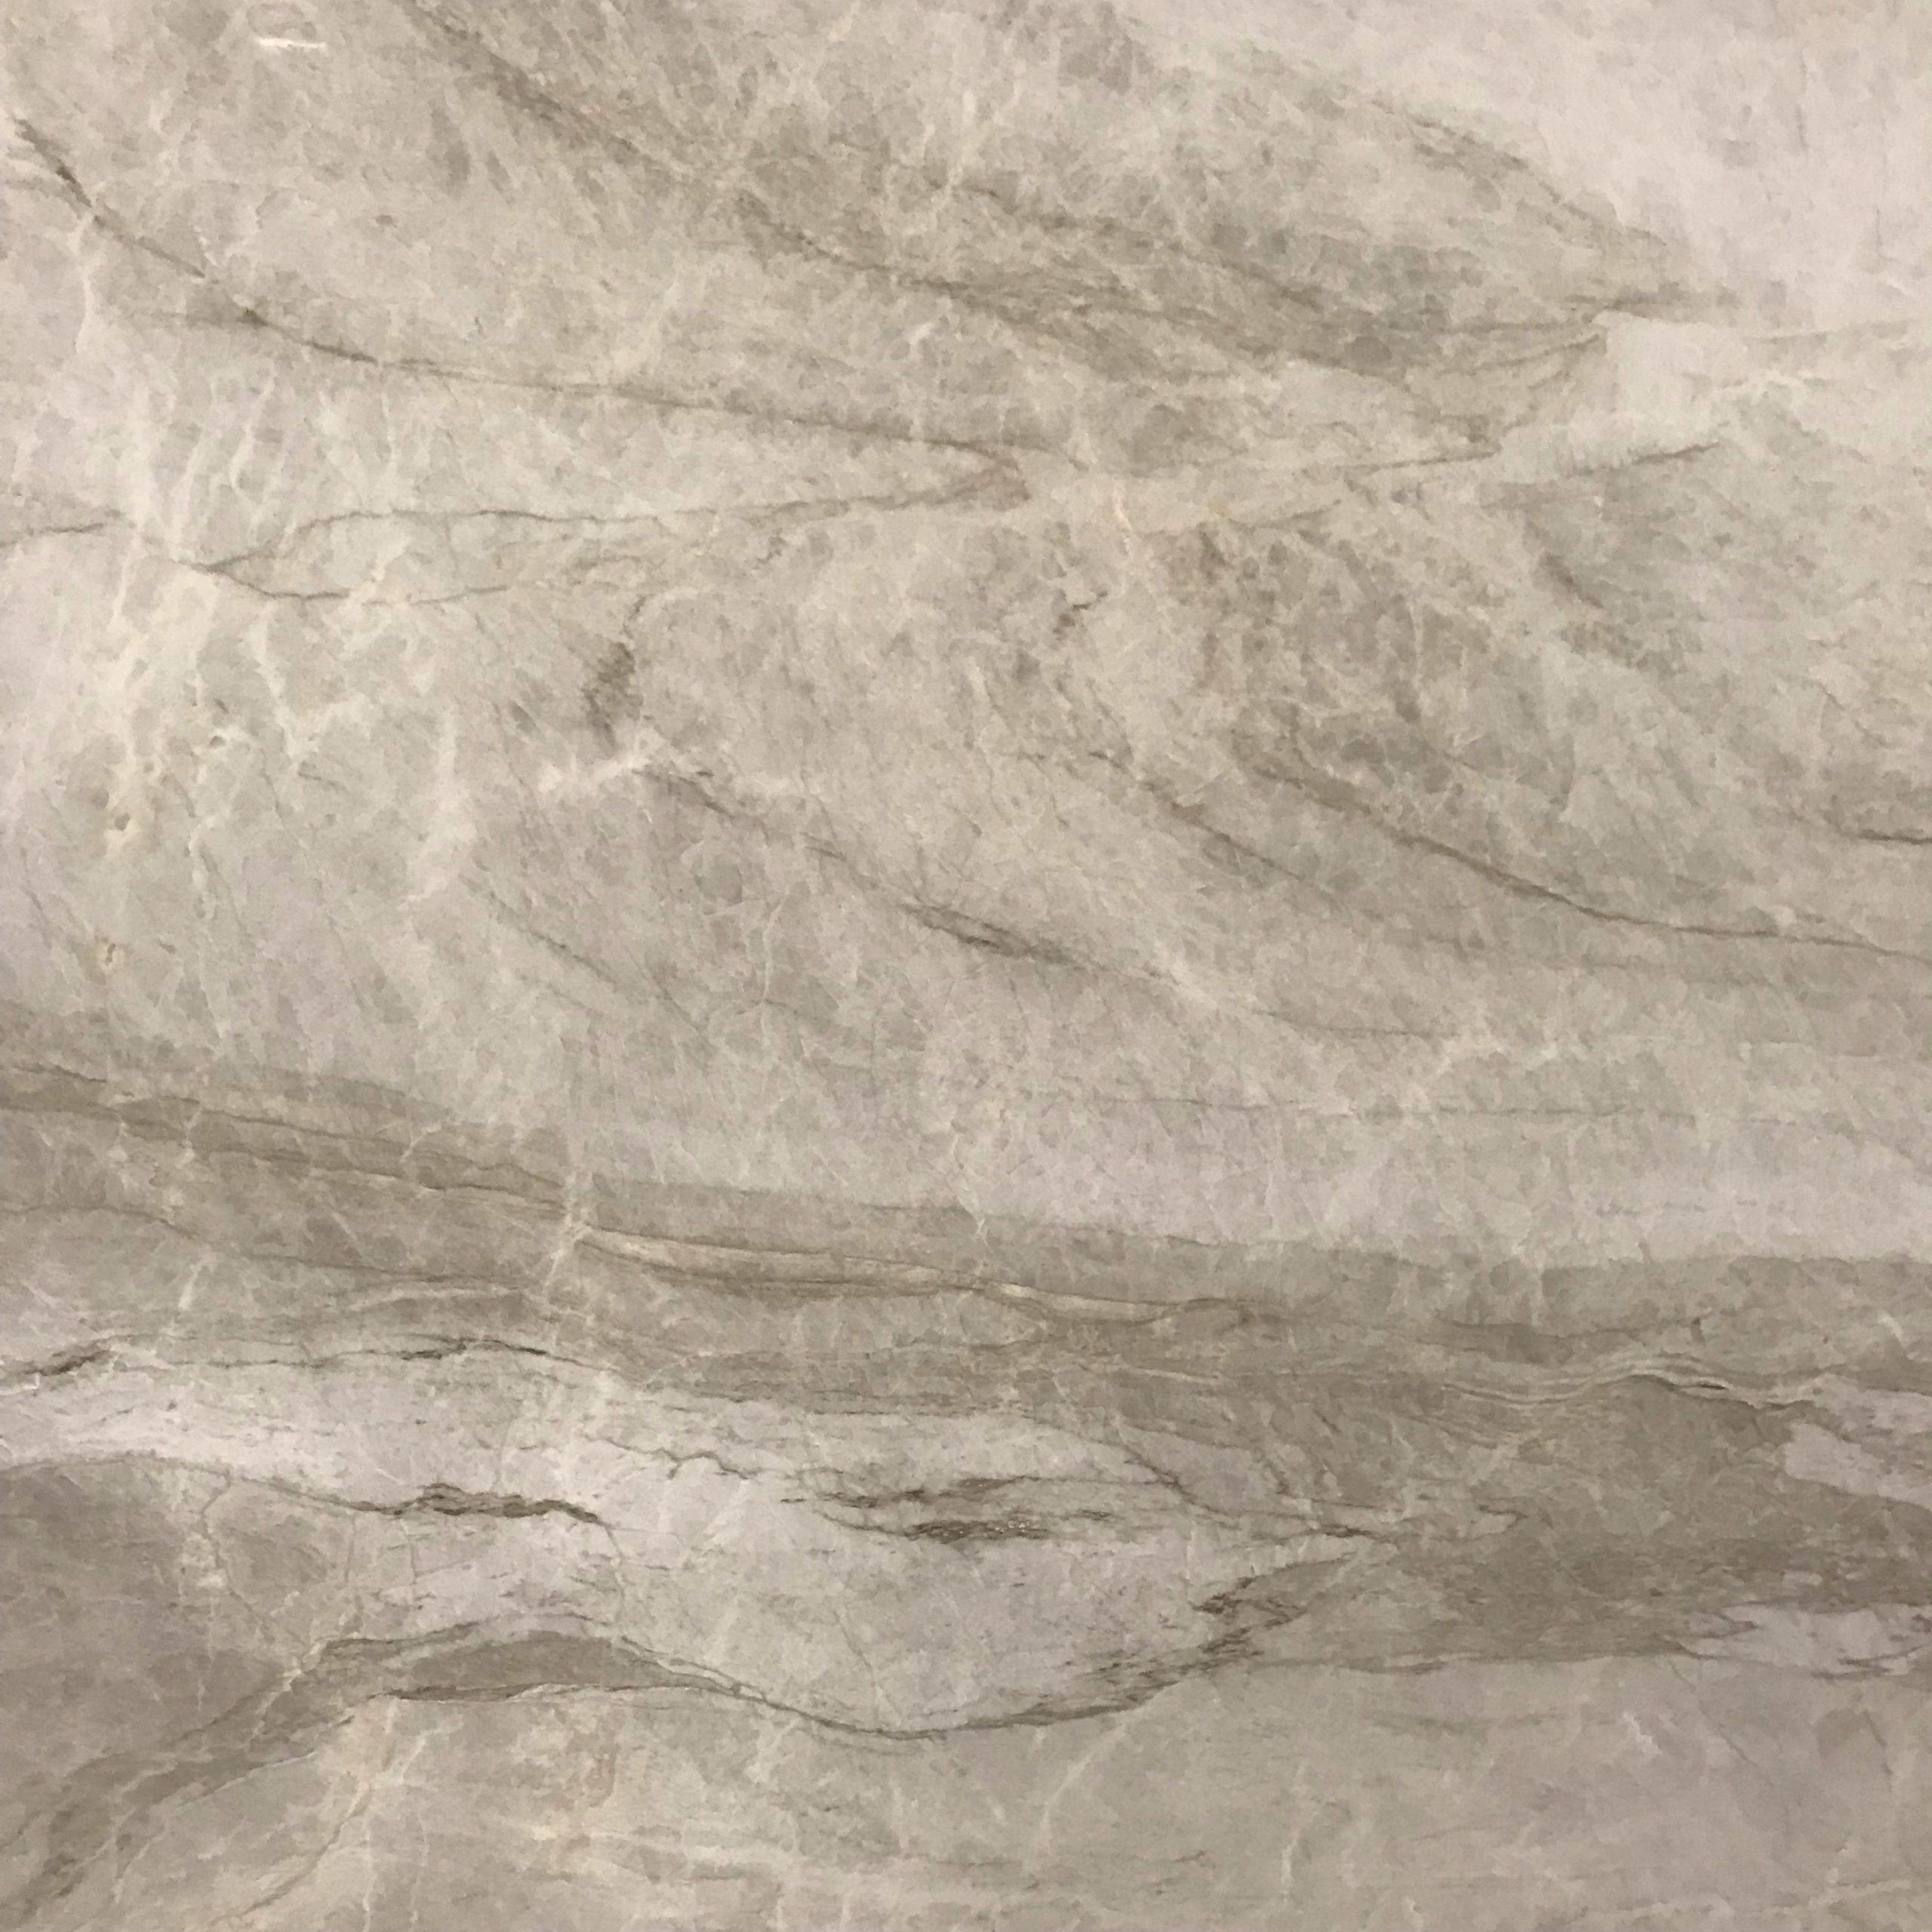 Perla Venata Marble Trend Marble Granite Tiles